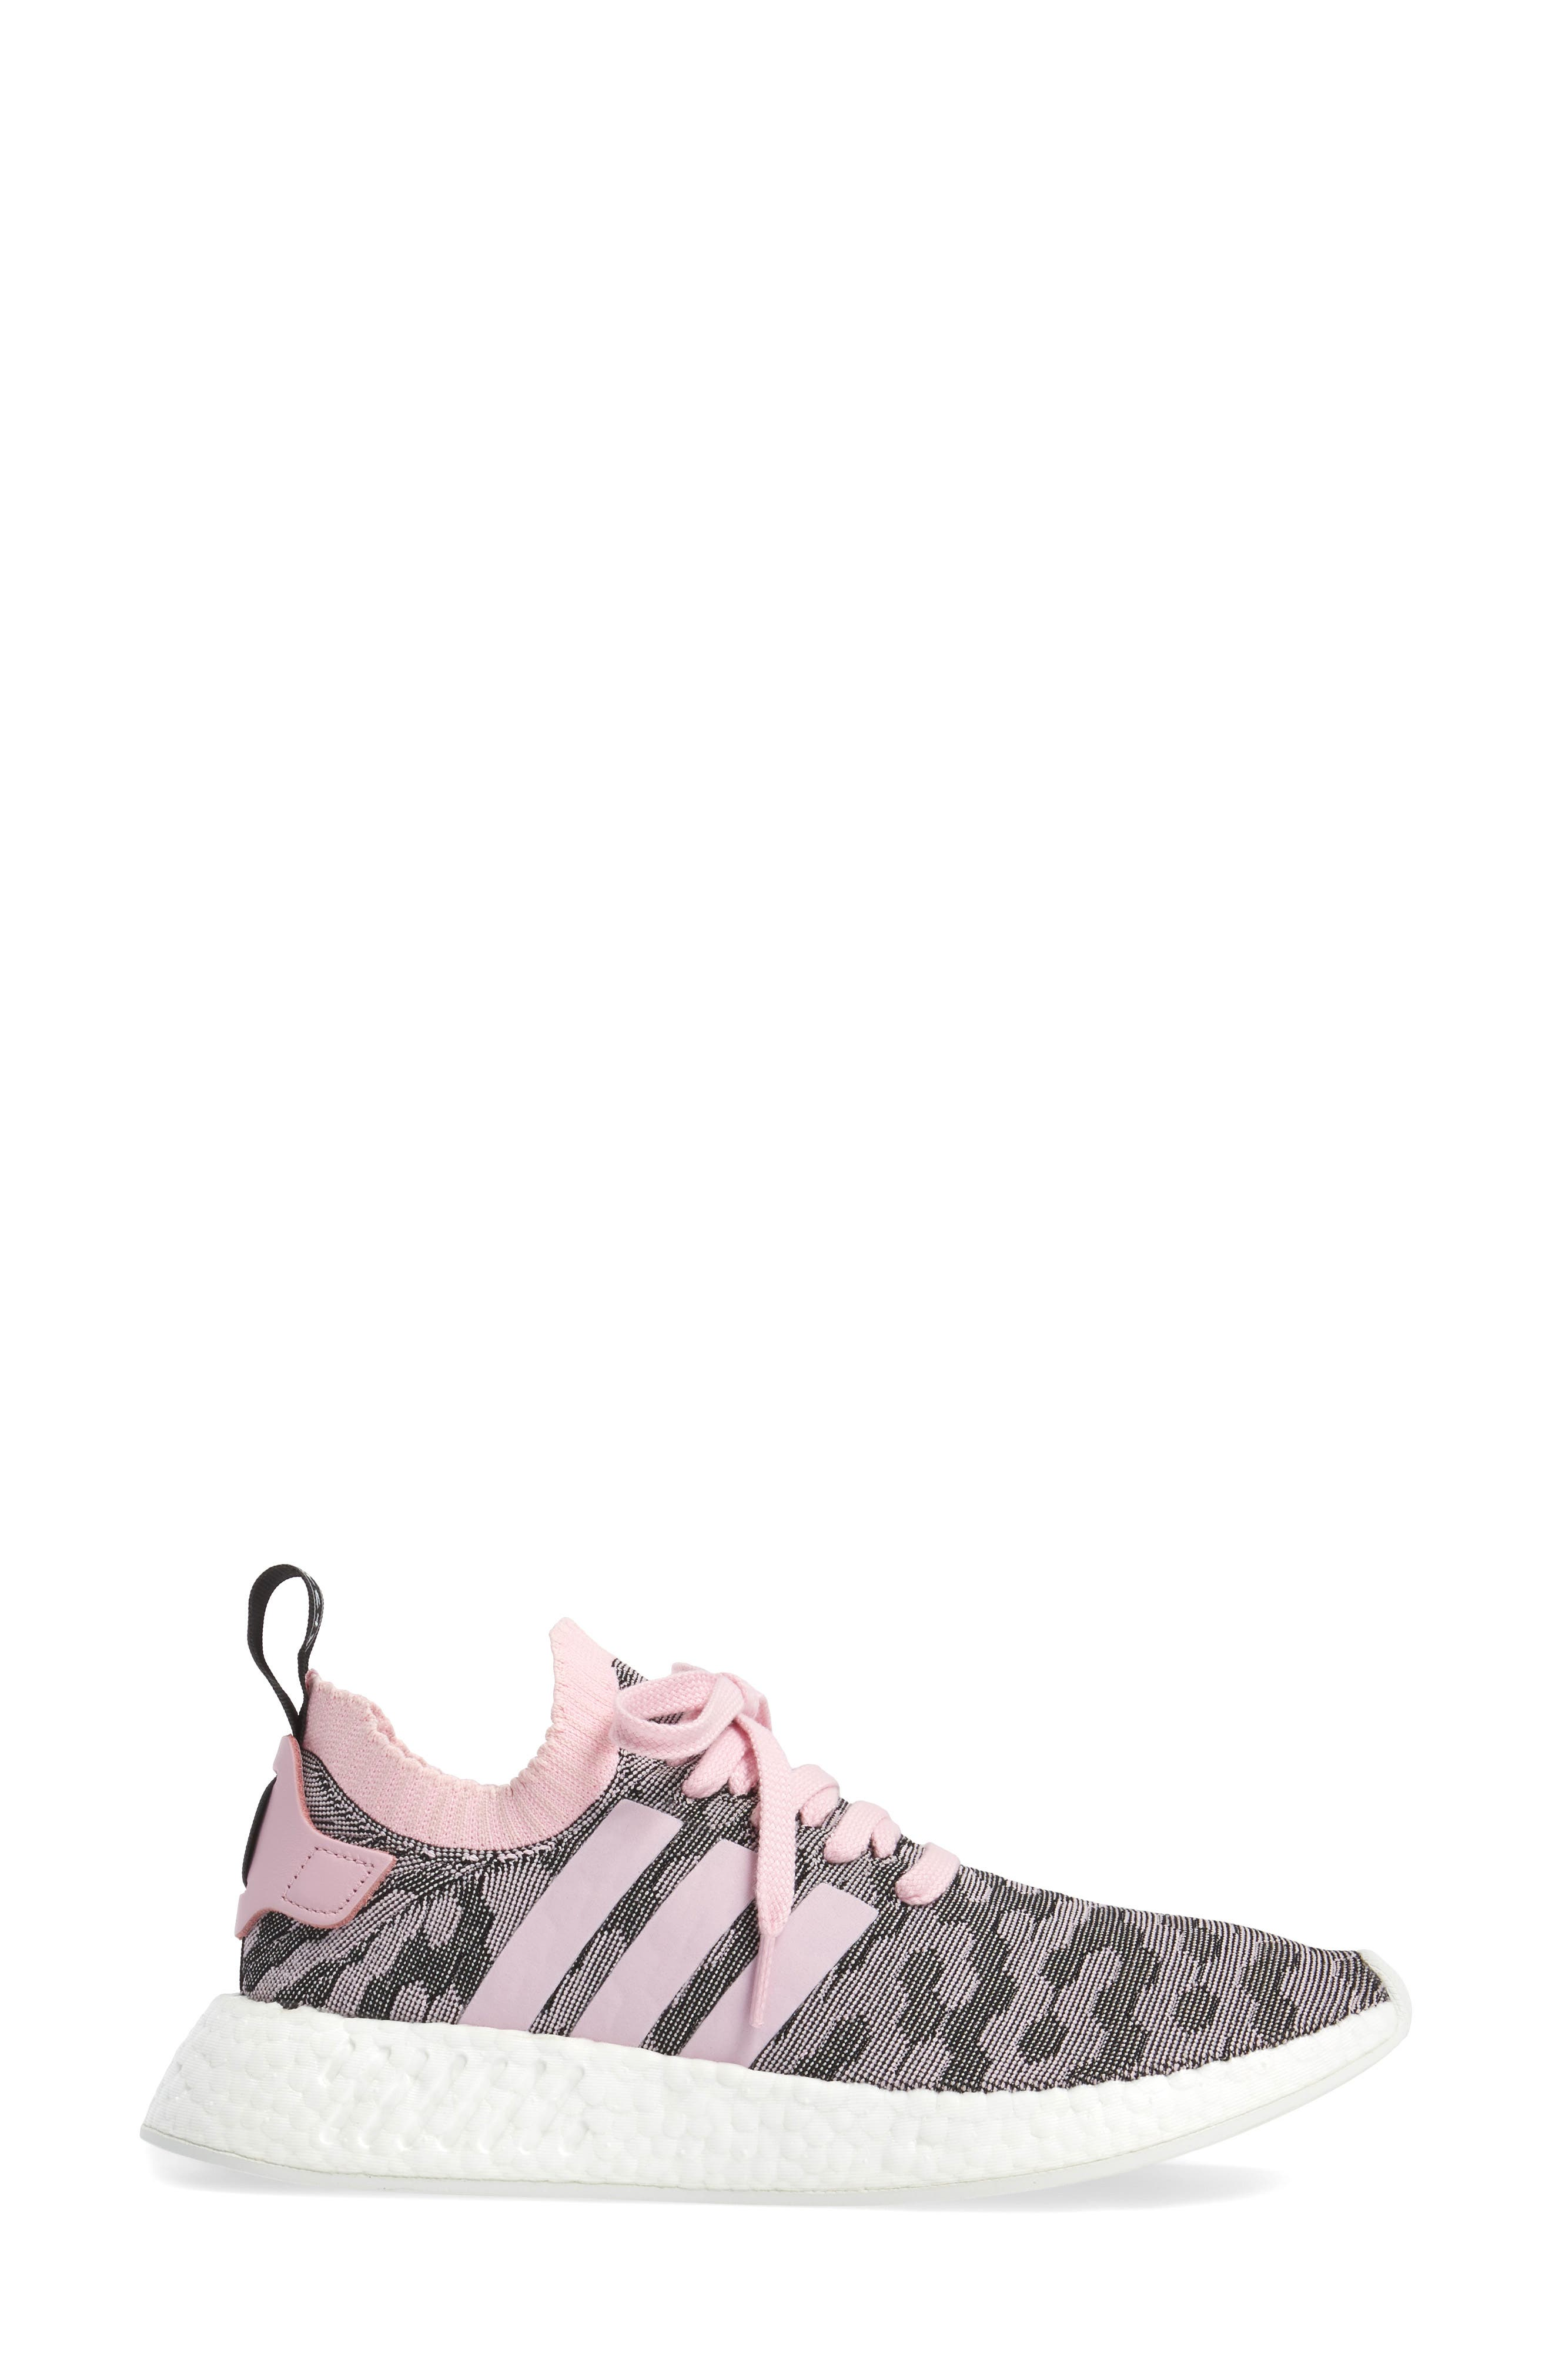 NMD R2 Primeknit Athletic Shoe,                             Alternate thumbnail 15, color,